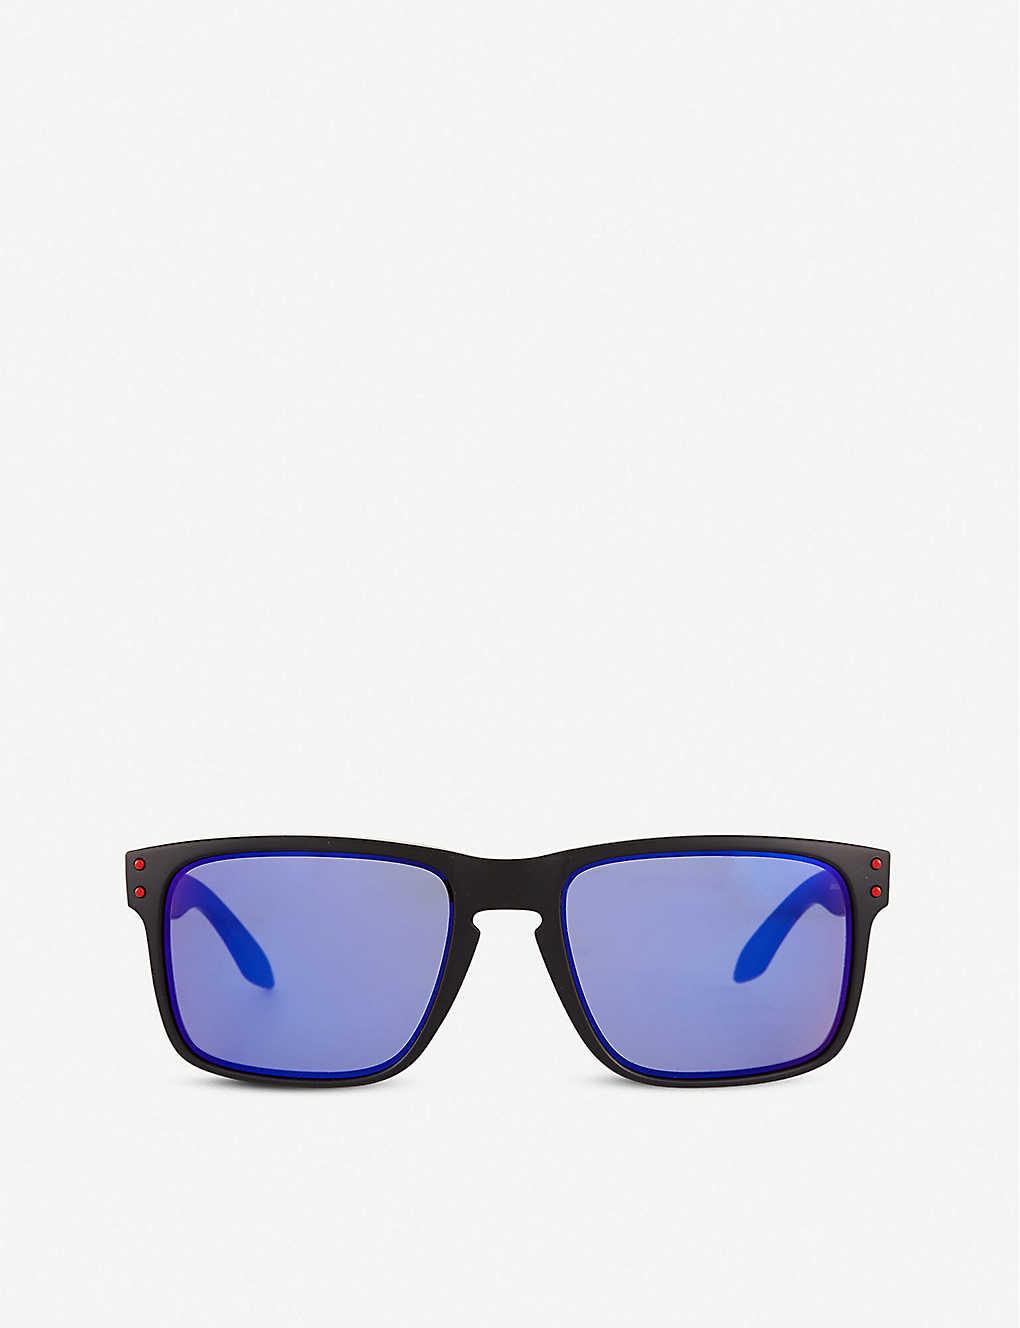 1c603e959a201 OAKLEY - Holbrook sunglasses